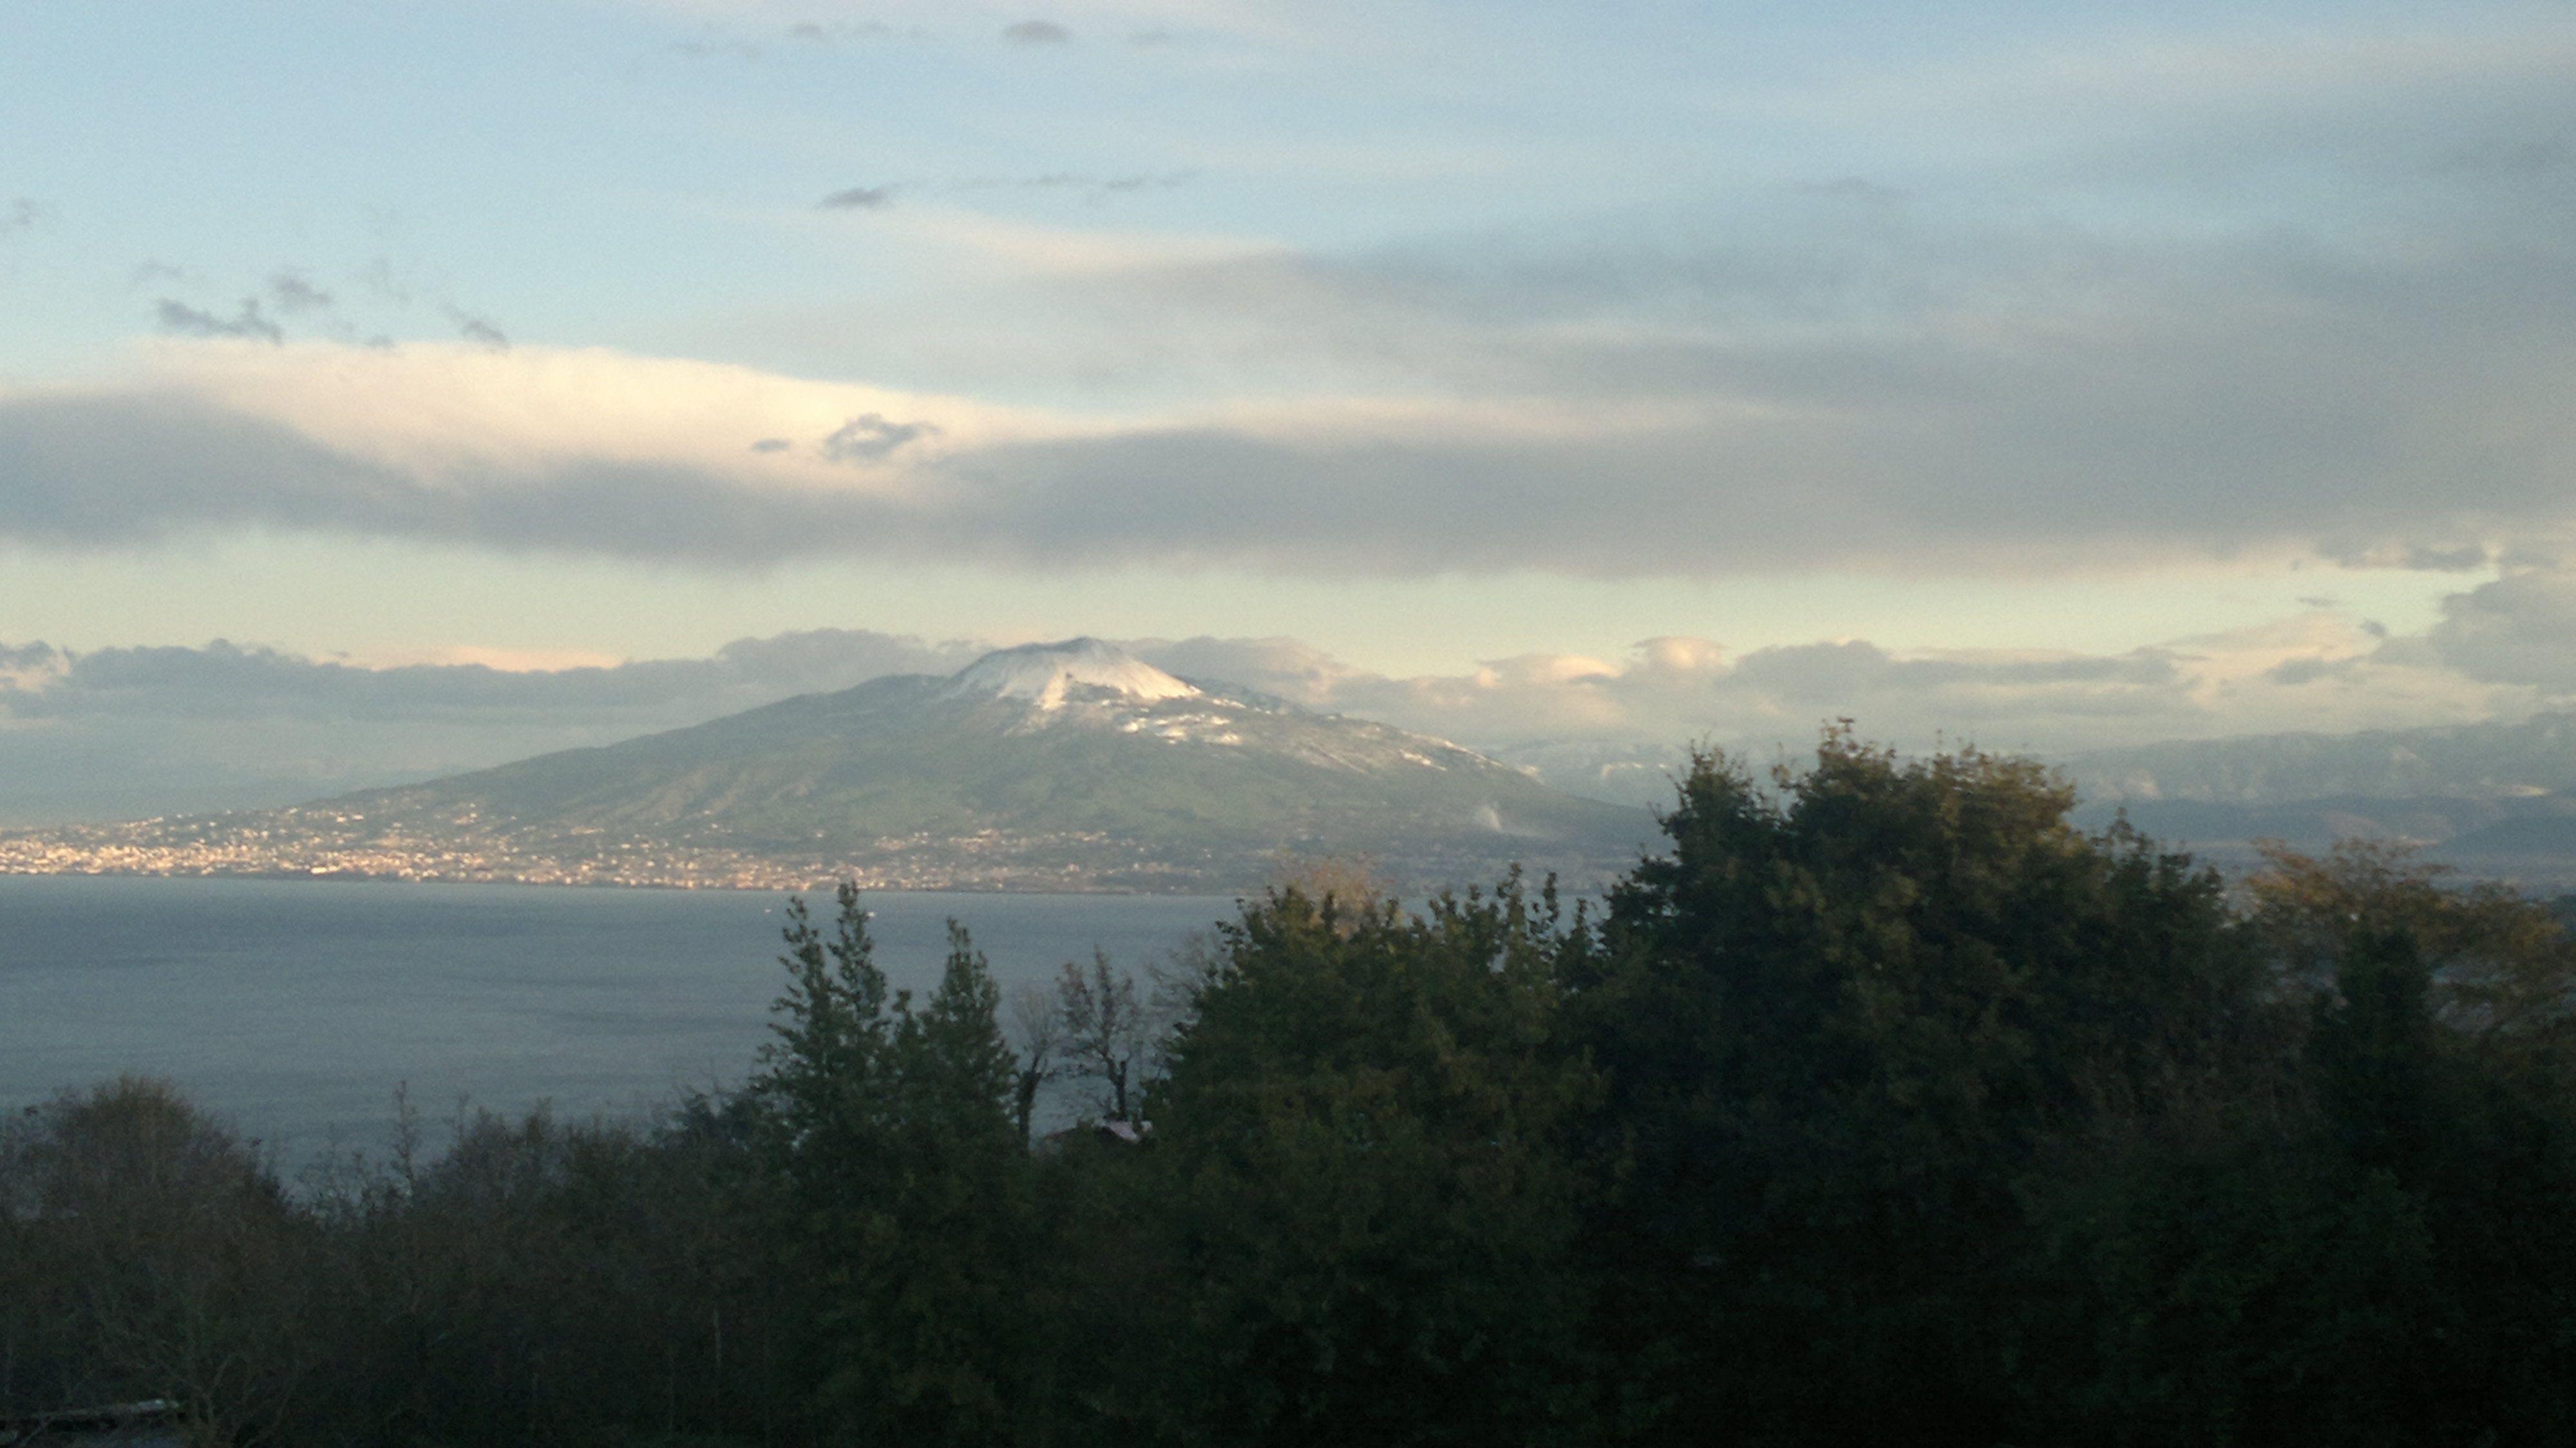 Neve sul Vesuvio vista da Sorrento. www.ilmegliodisorrento.com